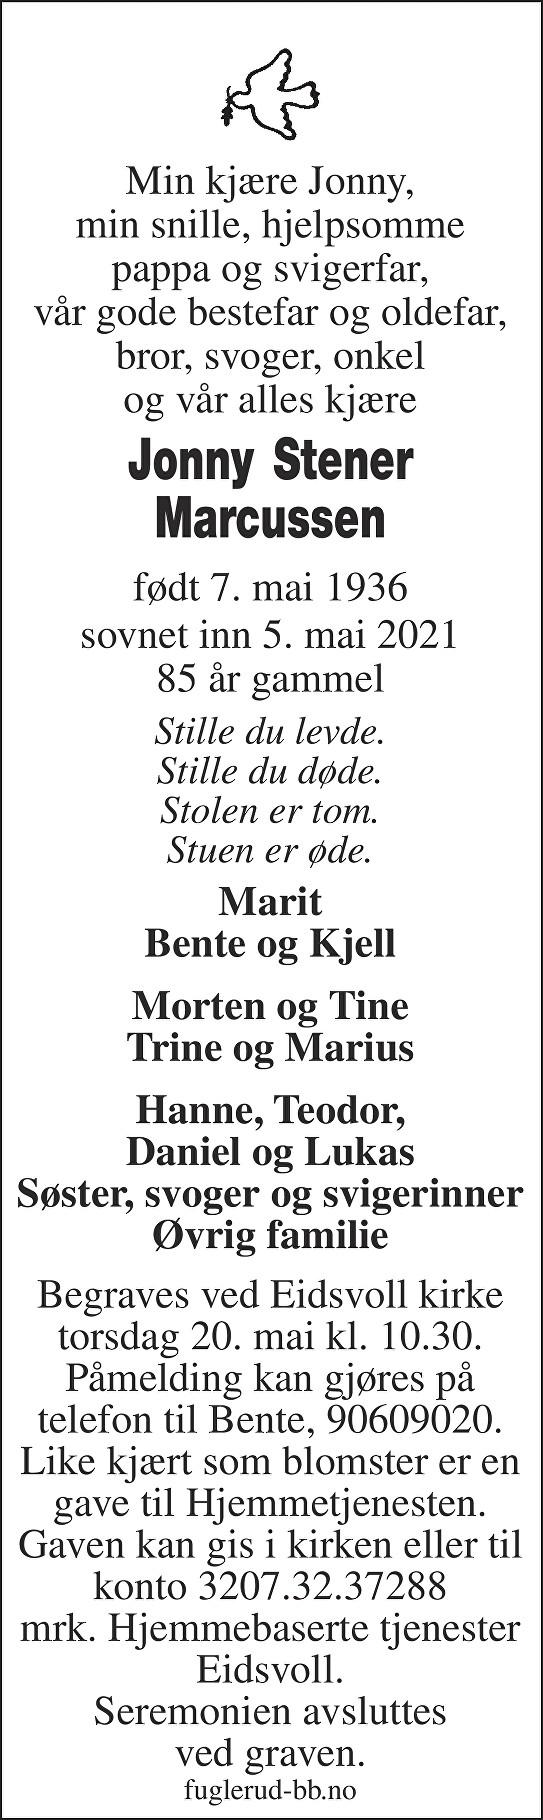 Jonny Stener Marcussen Dødsannonse